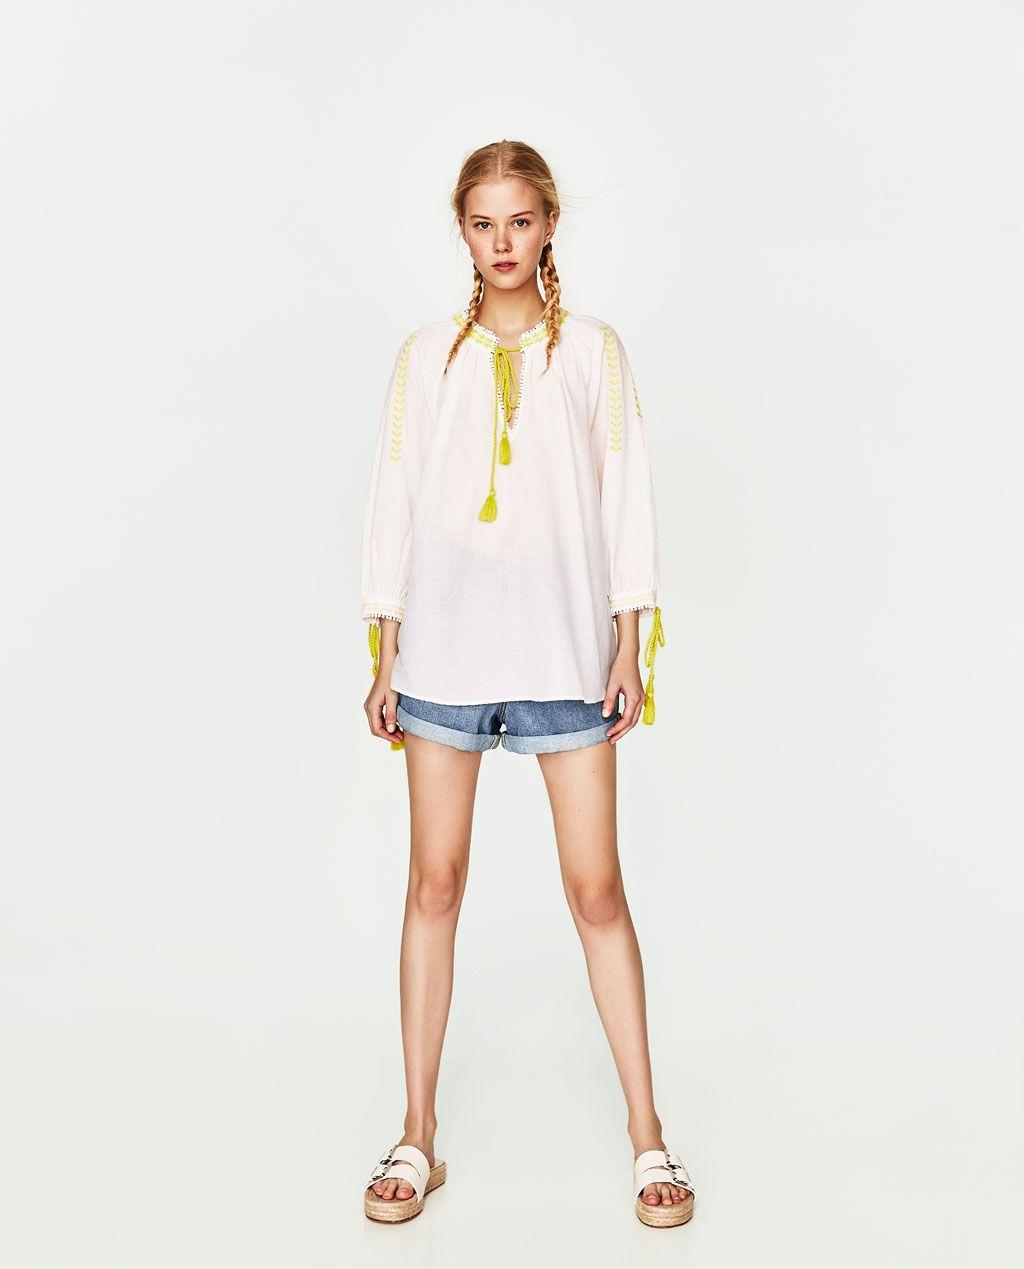 6c3d9b4d725 ZARA - FEMME - TOP STYLE TUNIQUE BRODÉ Embroidered Tunic, Zara Women, Tunic  Tops